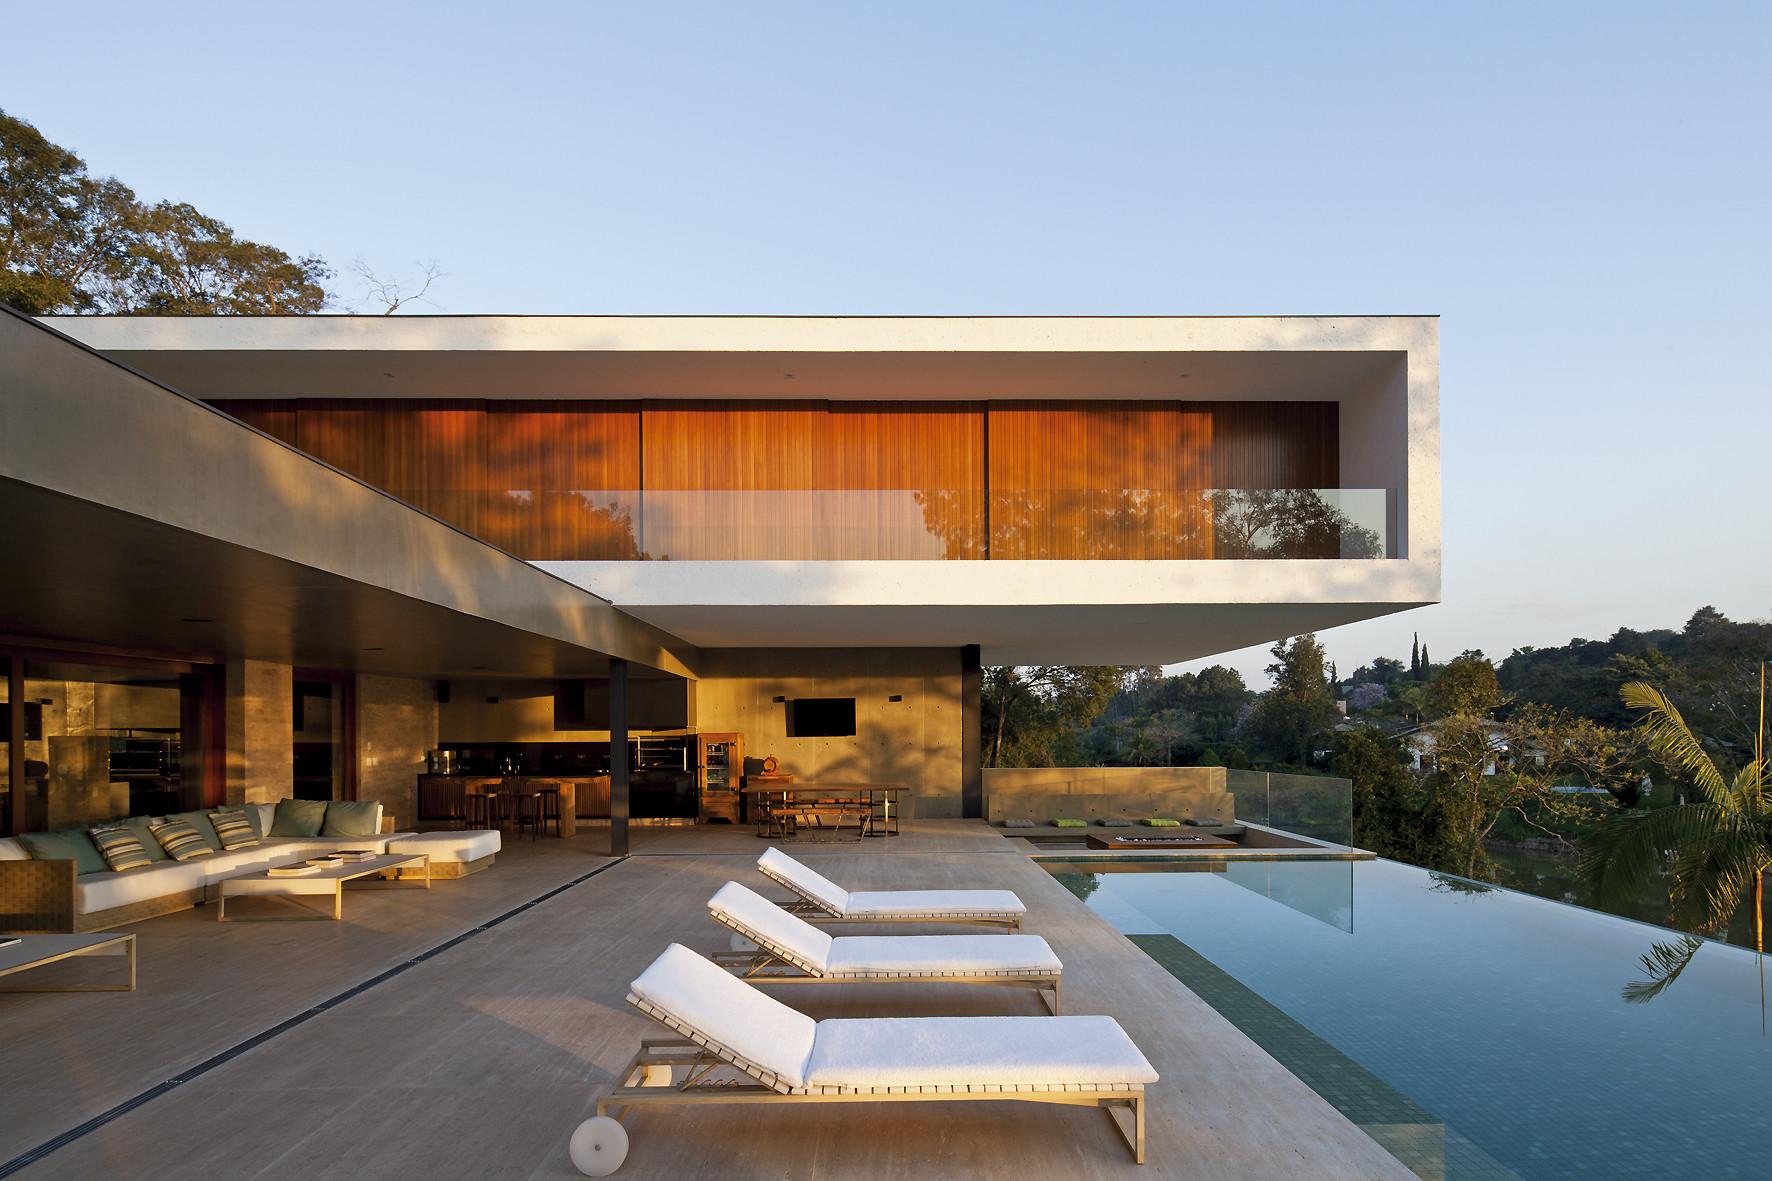 PV House / Sérgio Sampaio Arquitetura + Planejamento, © Leonardo Finotti